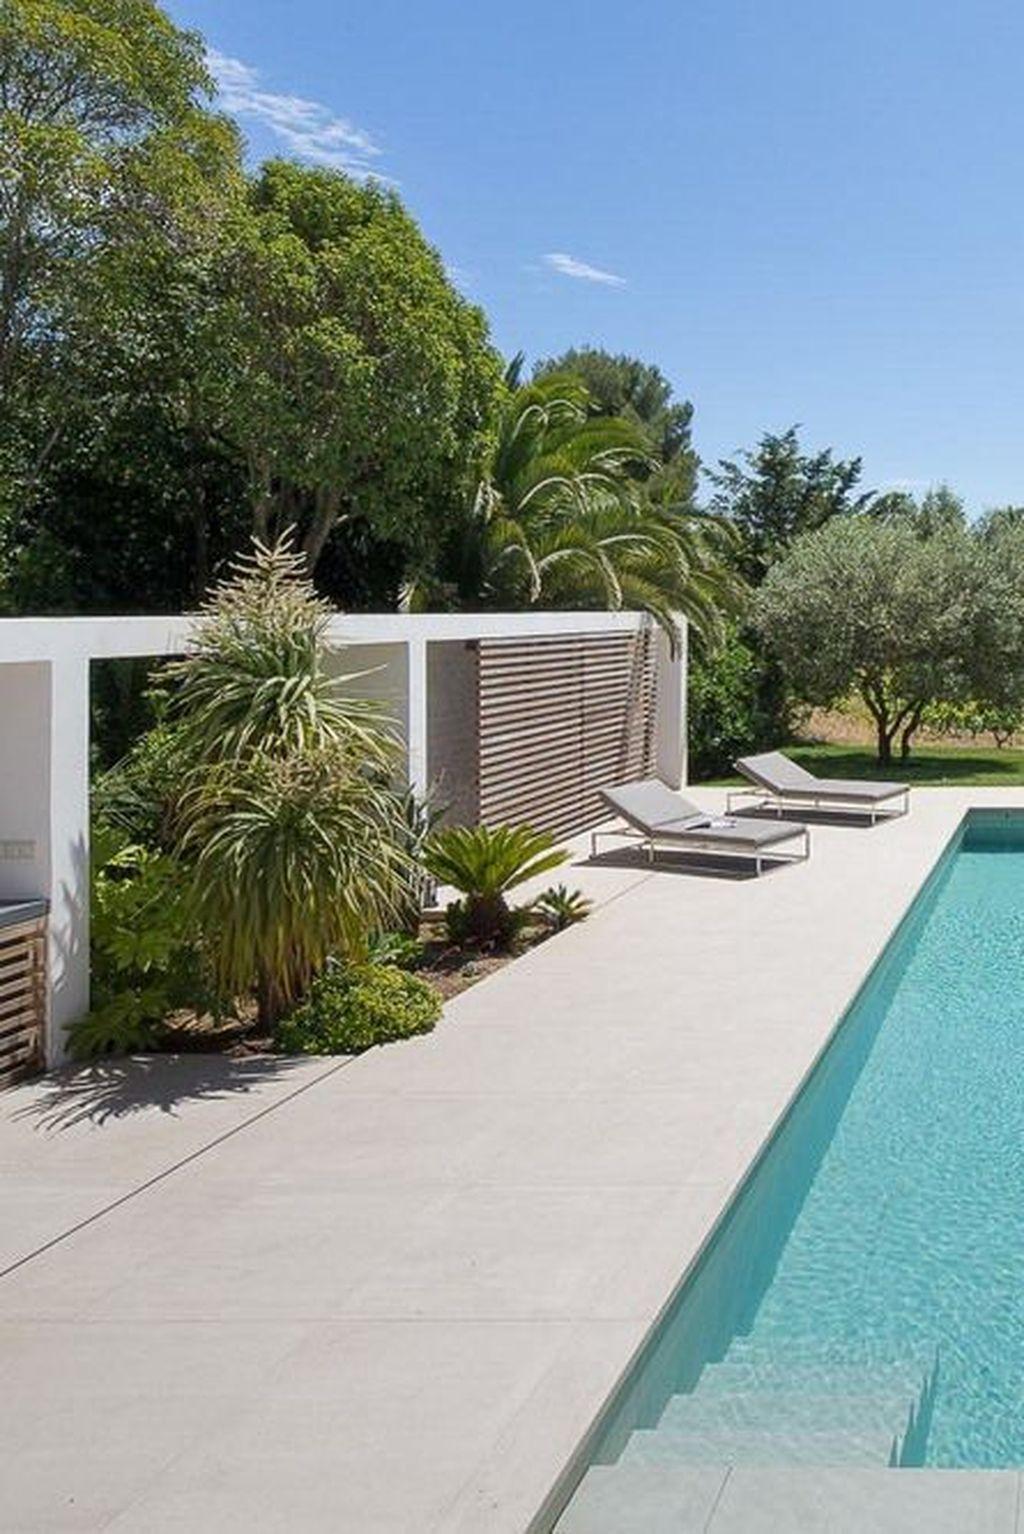 31 Cute Cabana Swimming Pool Design Ideas That Looks Charming In 2020 Pool Landscape Design Pool Landscaping Backyard Pool